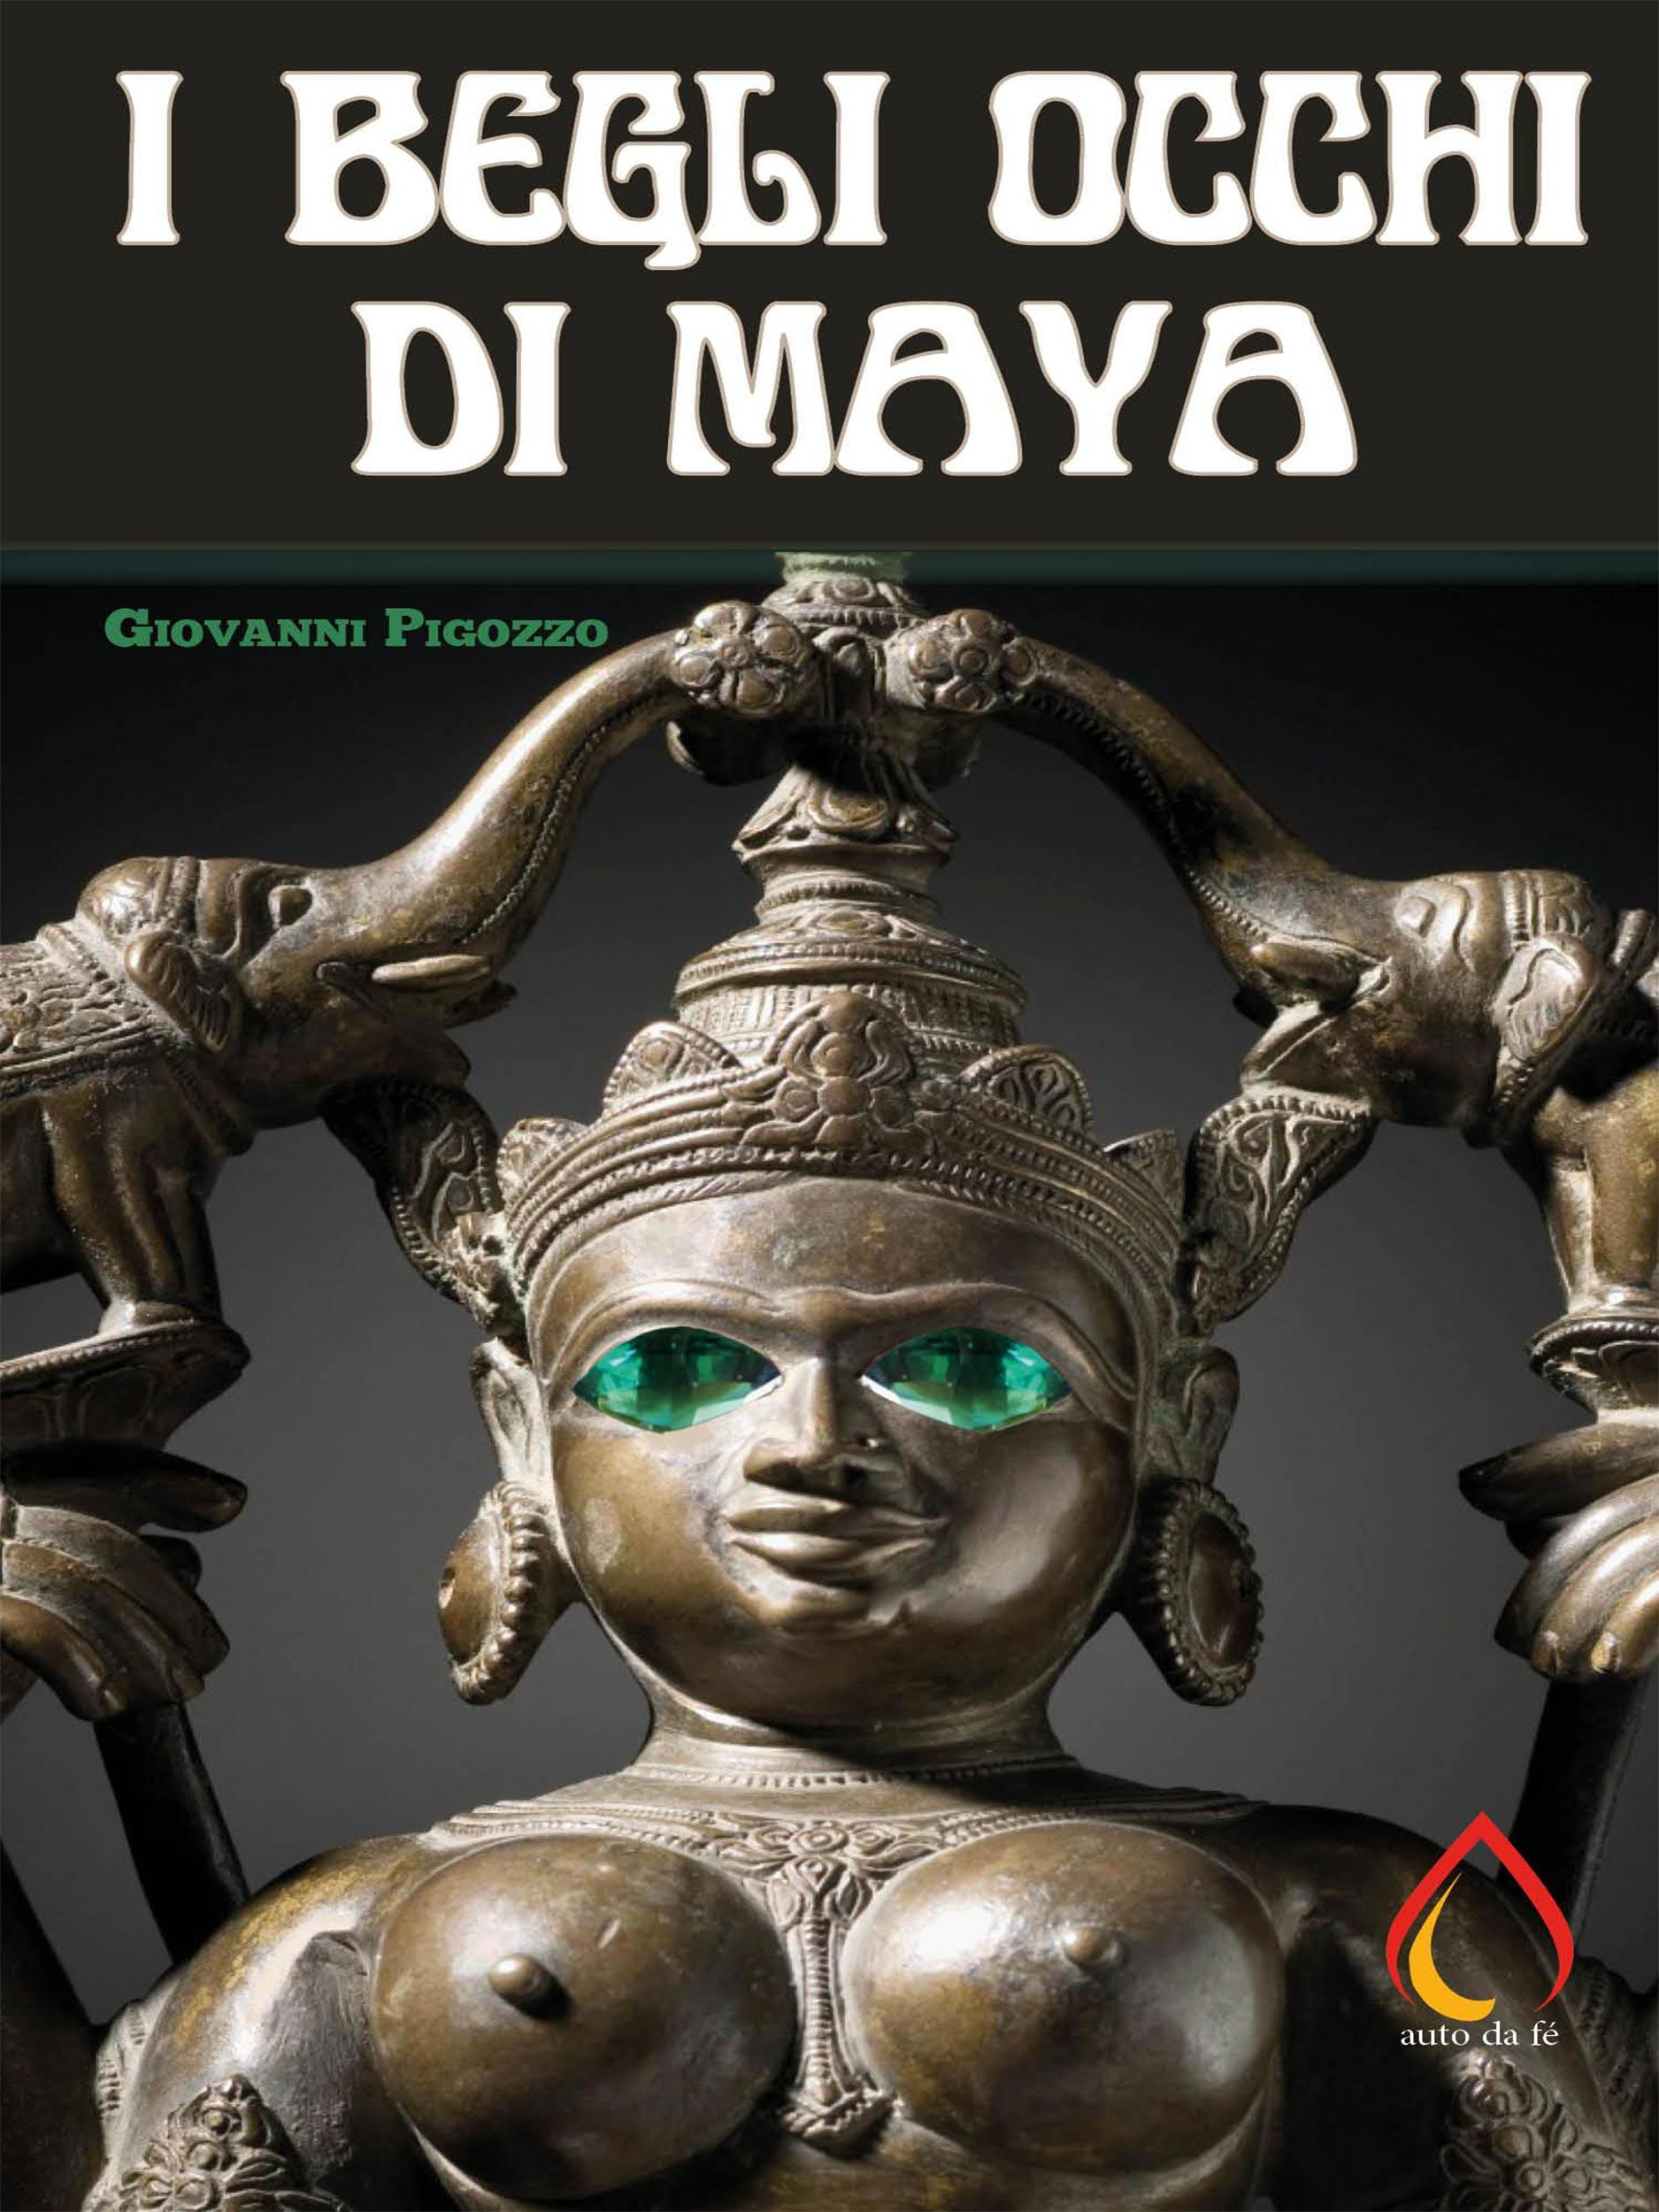 I Begli occhi di Maya